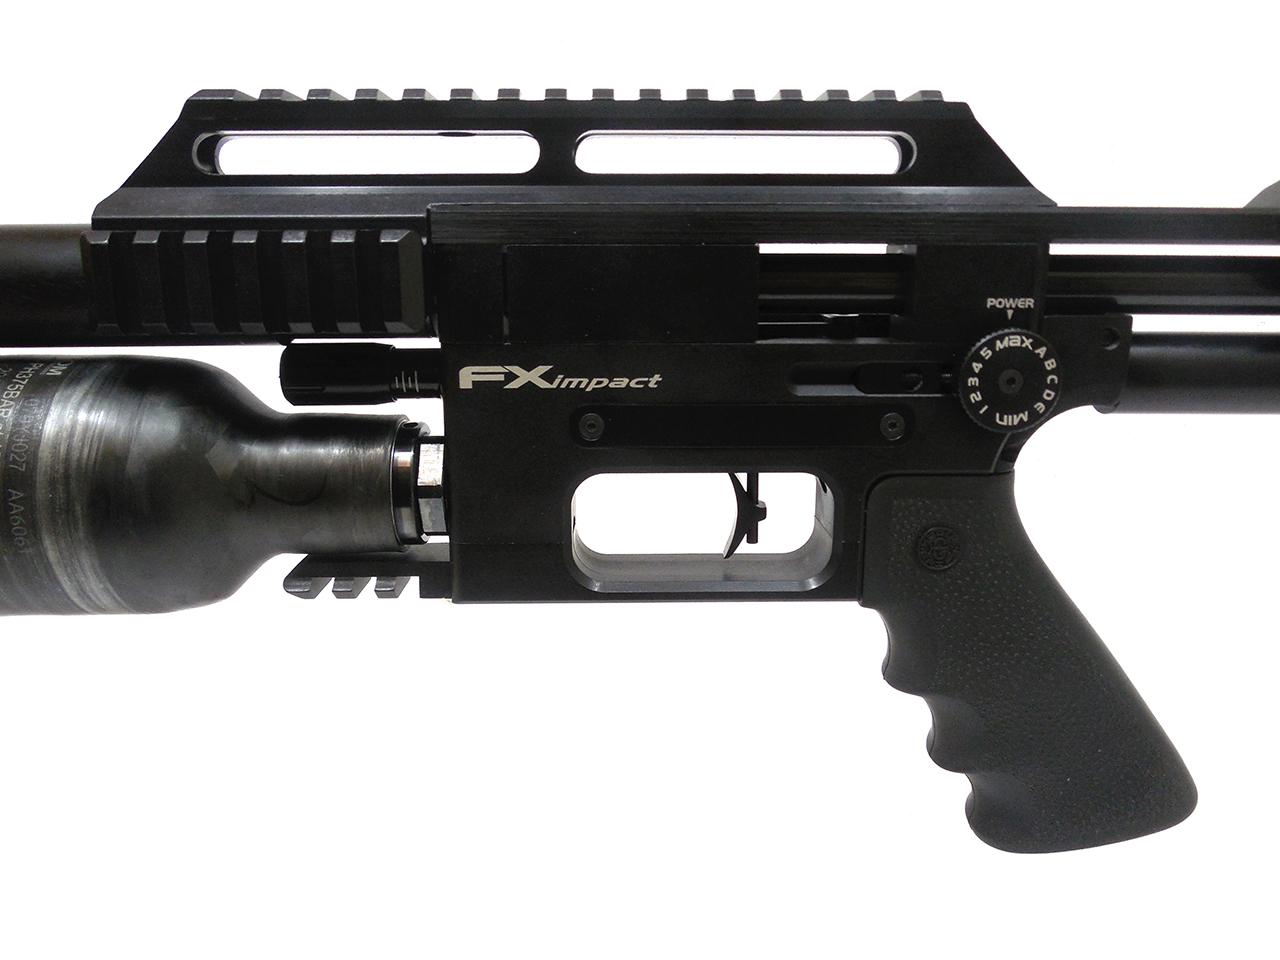 FX Impact Black With Telescoping Shroud